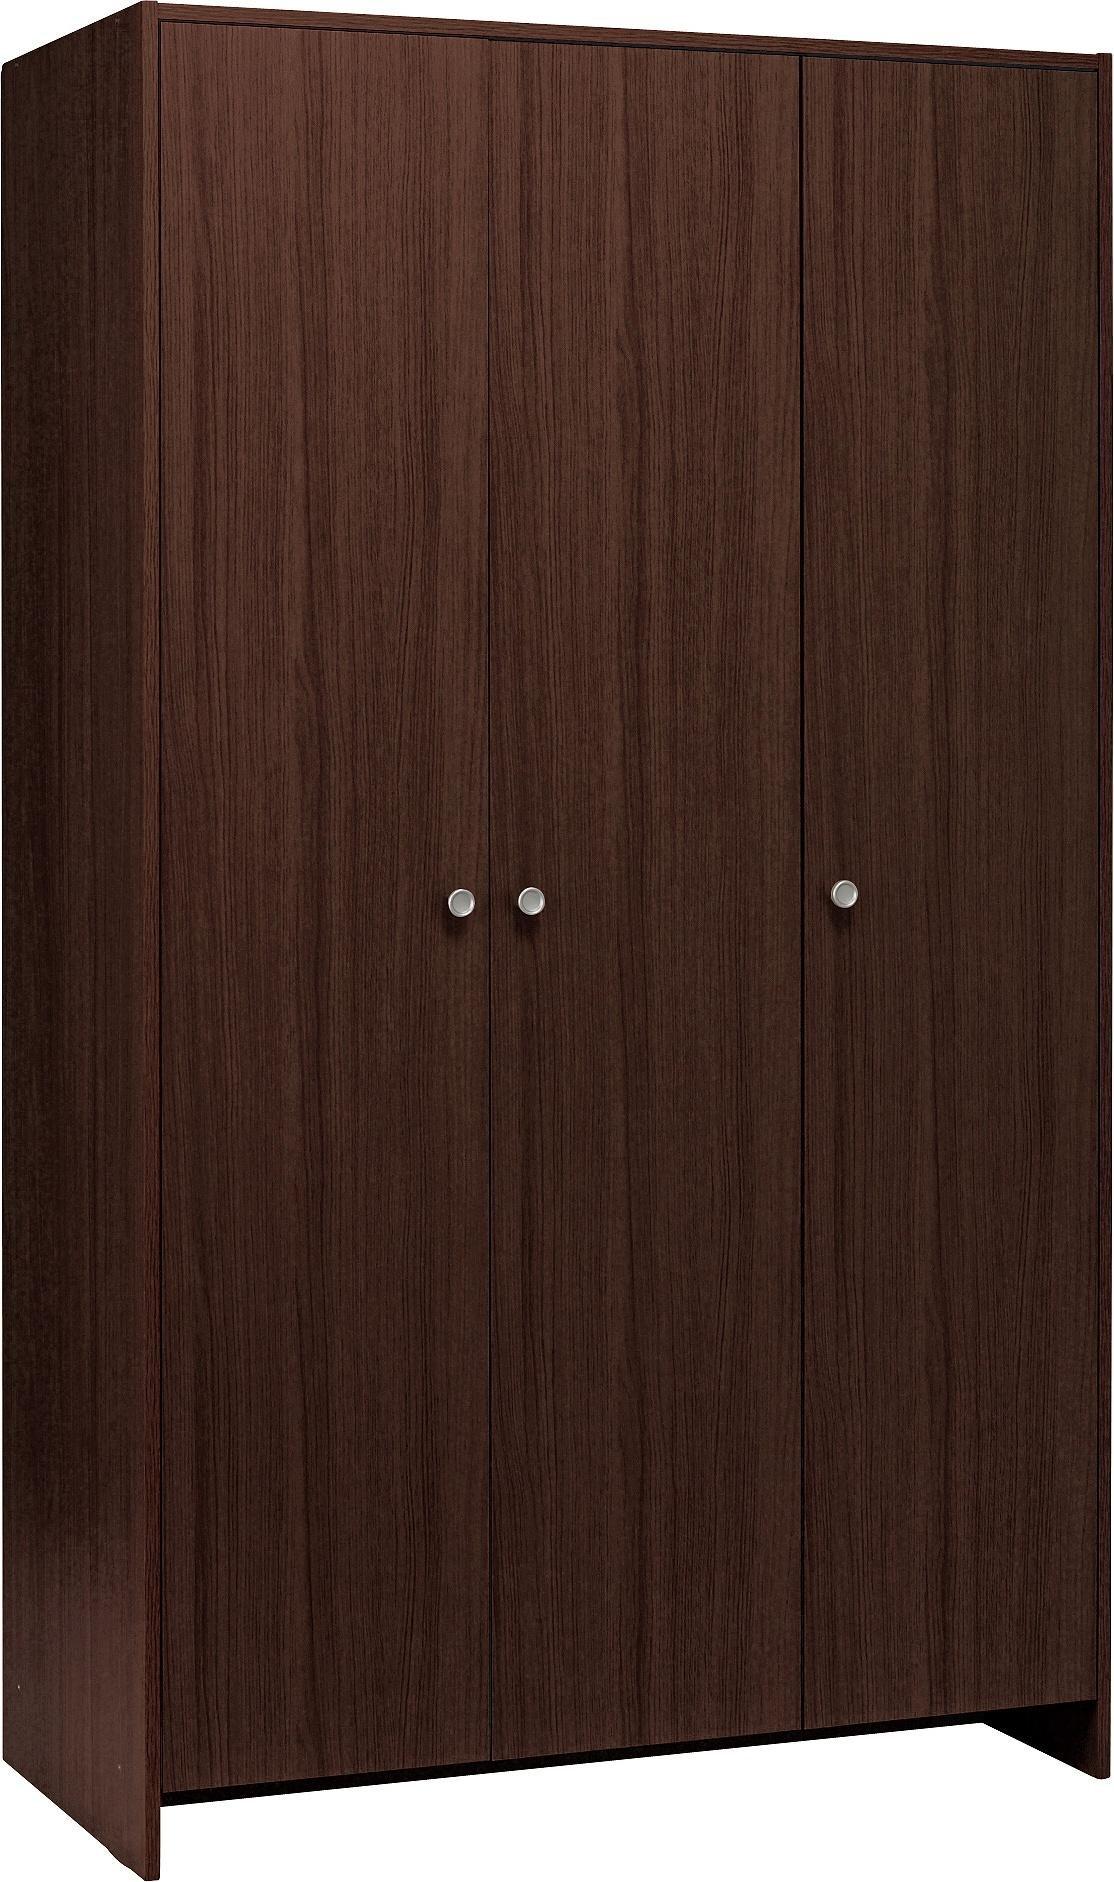 Argos Home Seville 3 Door Wardrobe - Dark Oak Effect